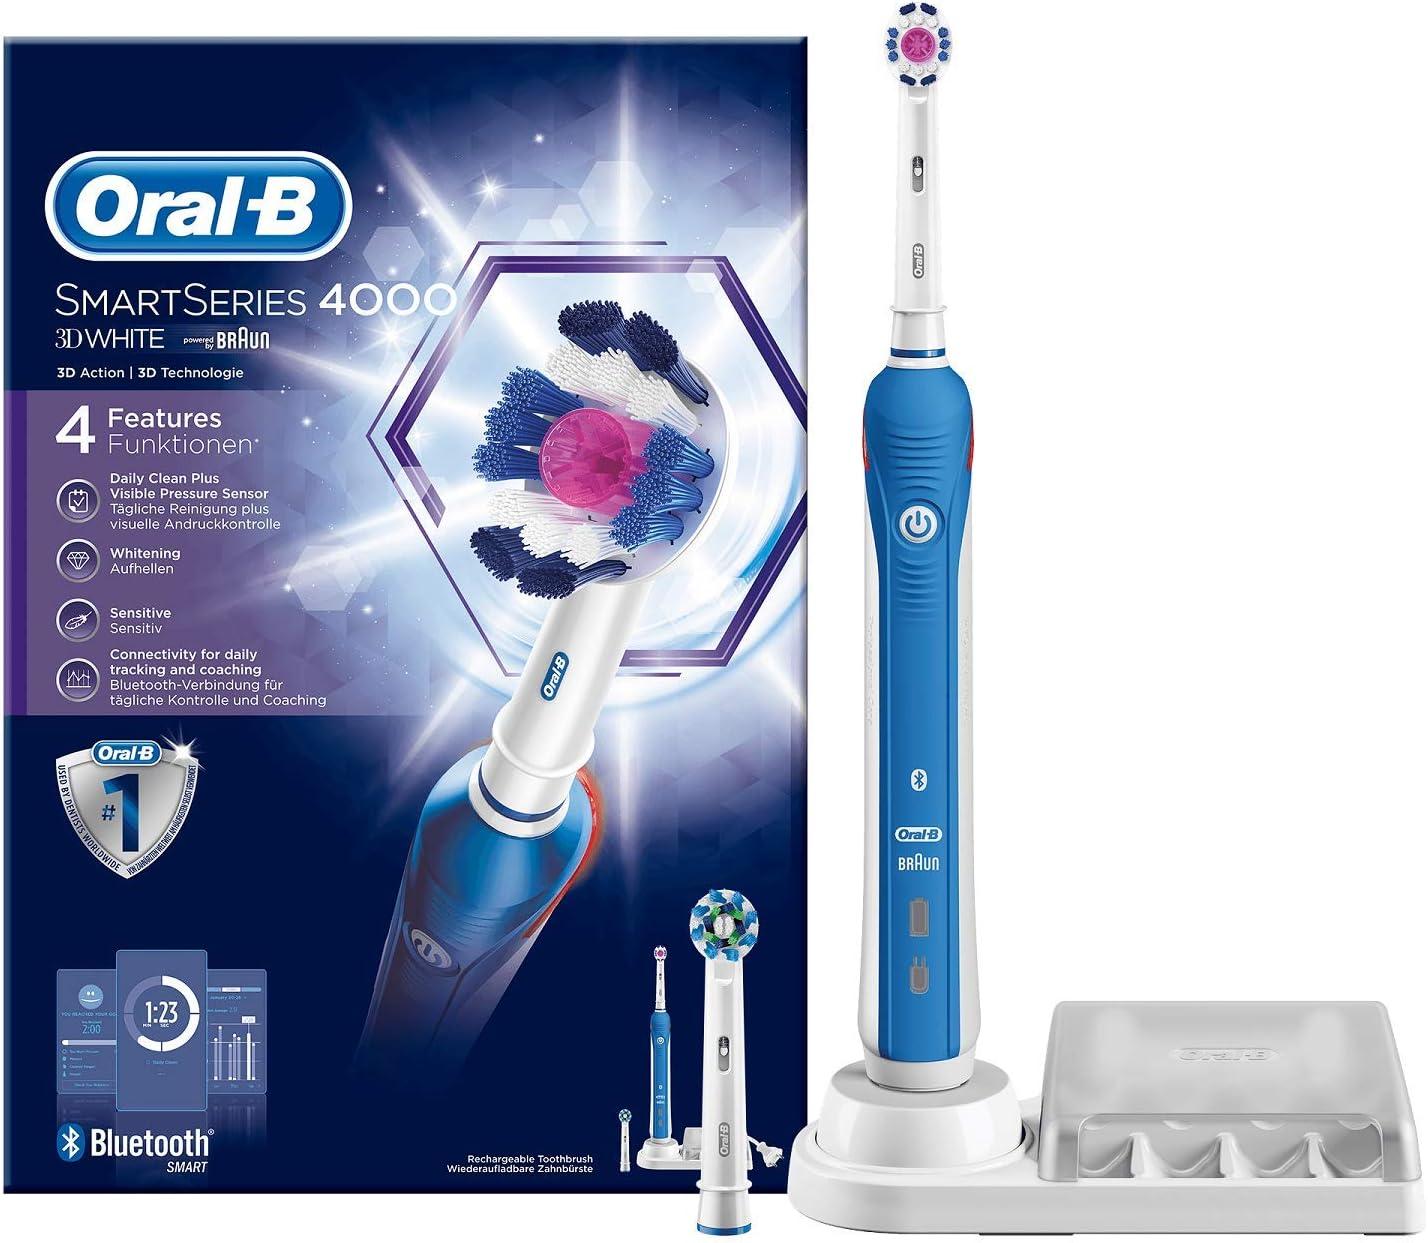 Braun Oral B SmartSeries 4000 3DWhite BT